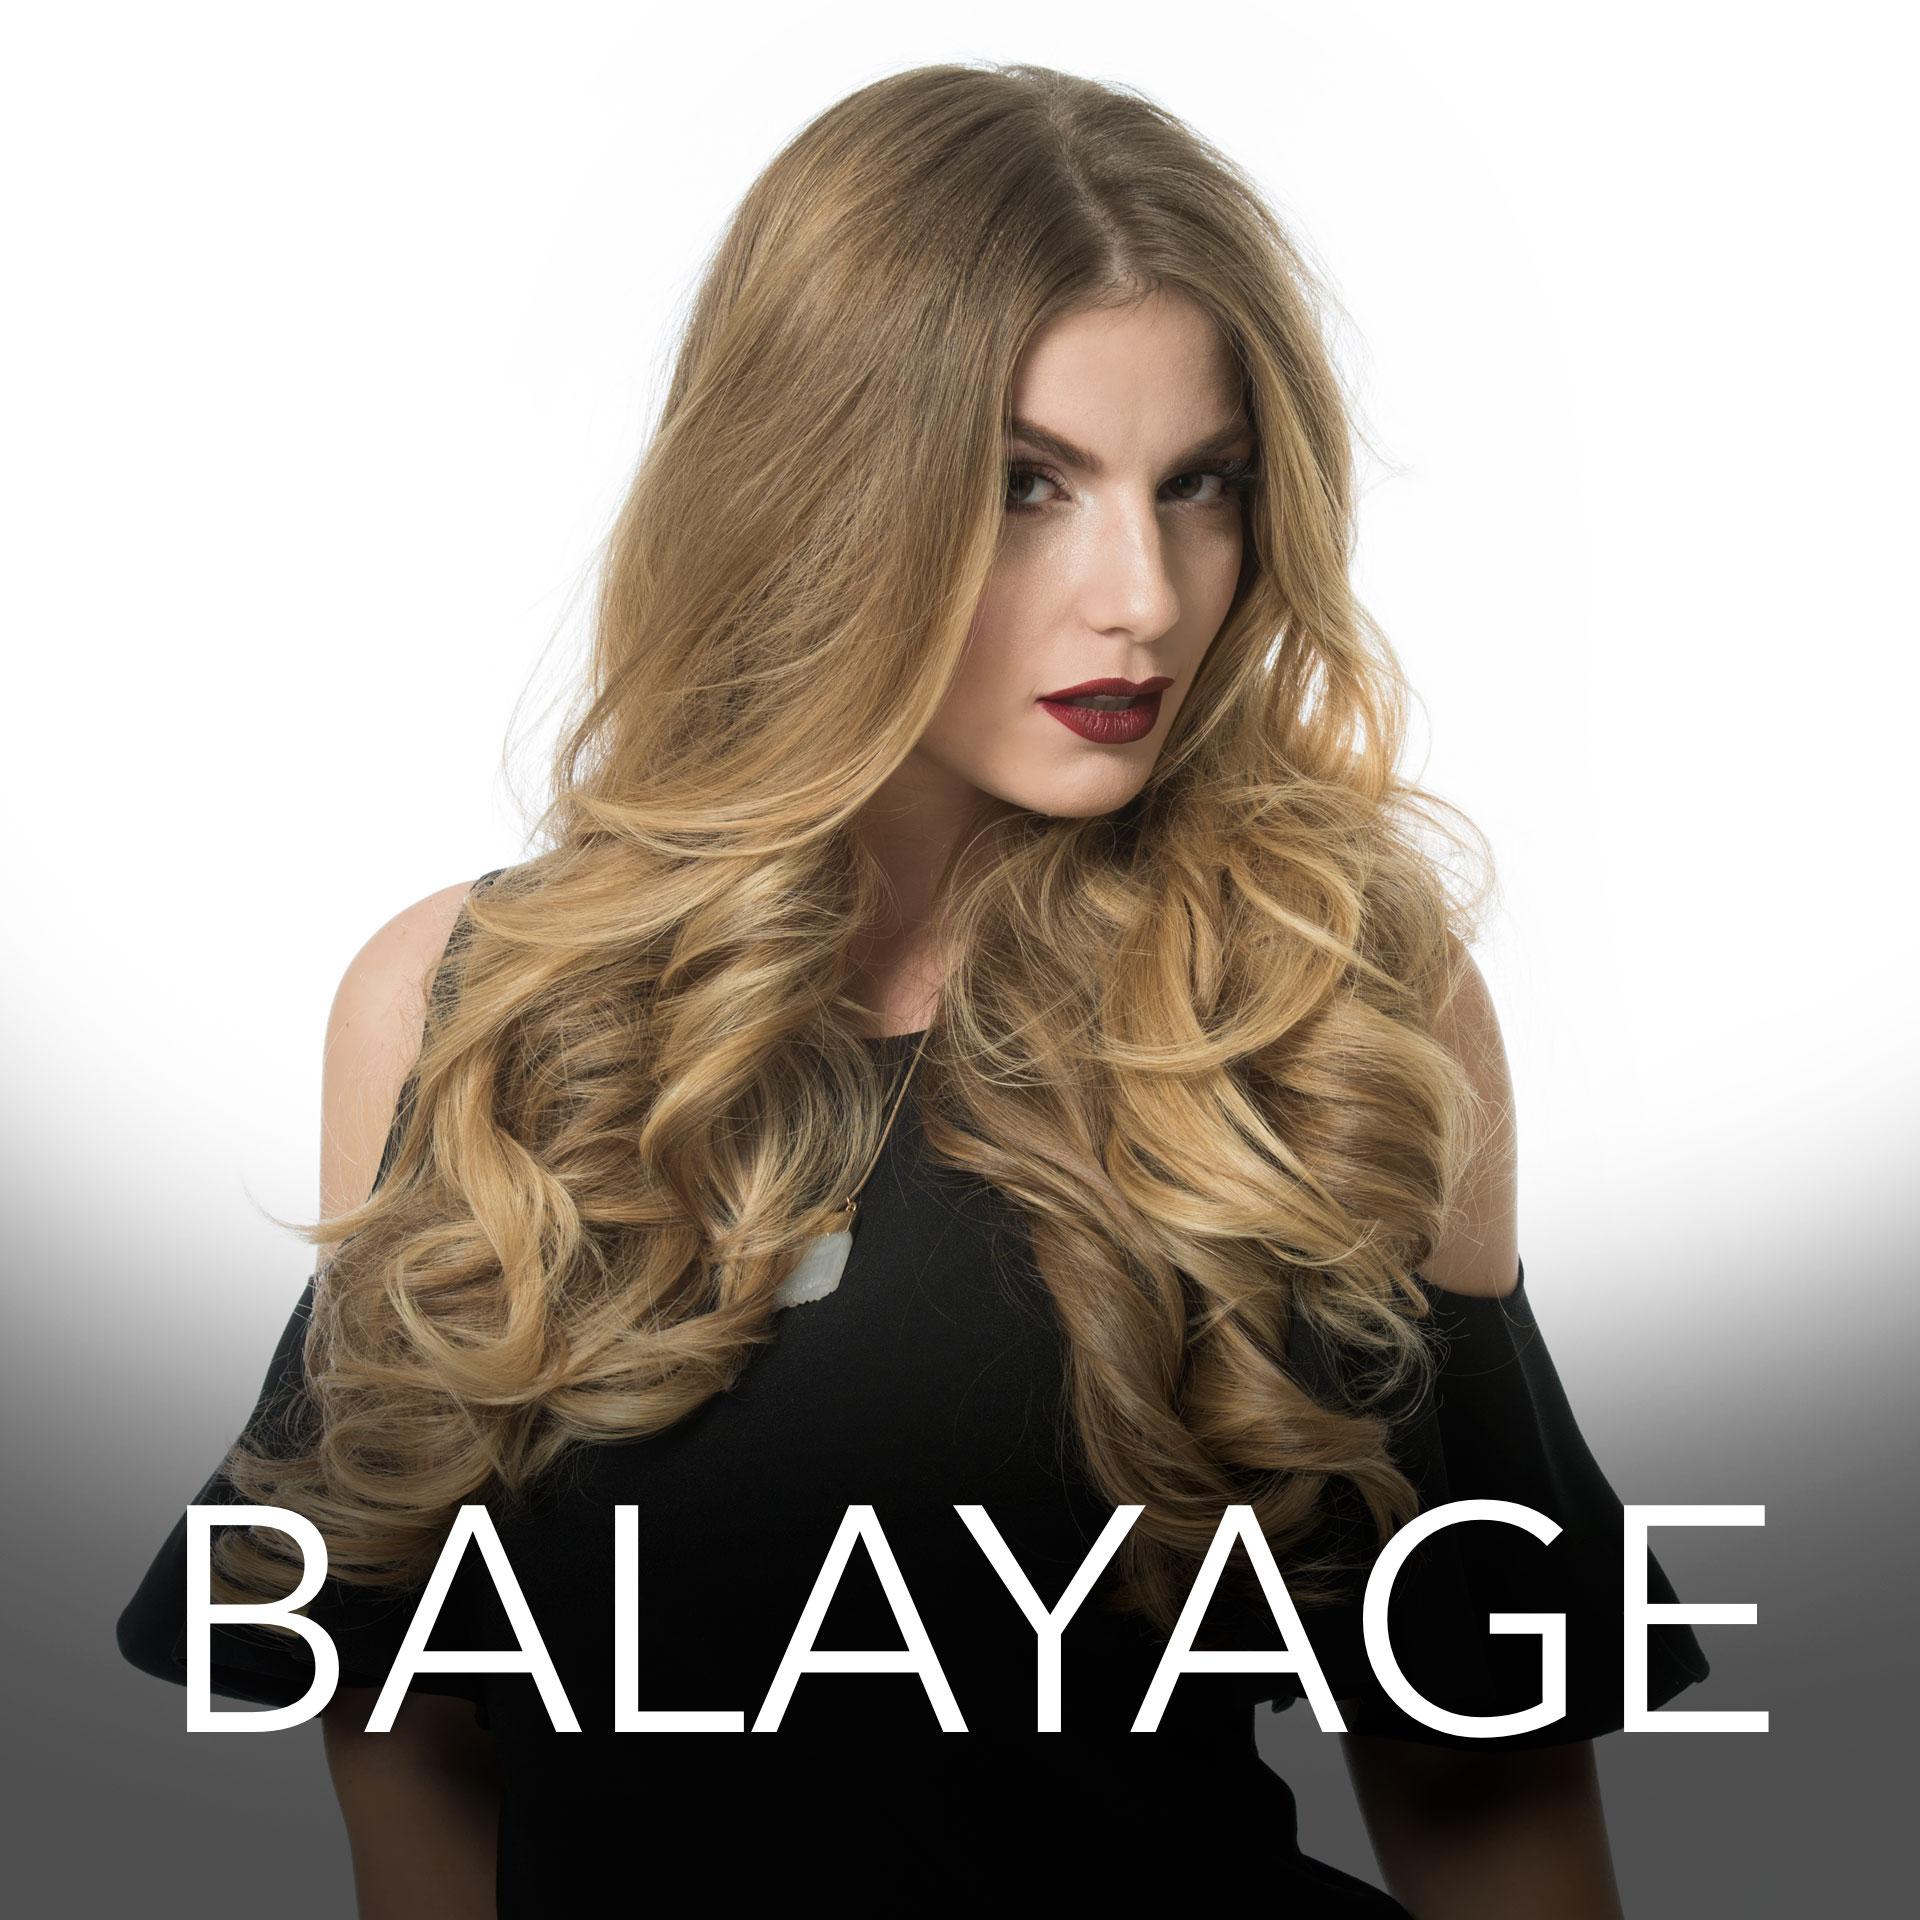 Best Hair Colorist Plano Frisco North Dallas Top Hair Color Salon ...